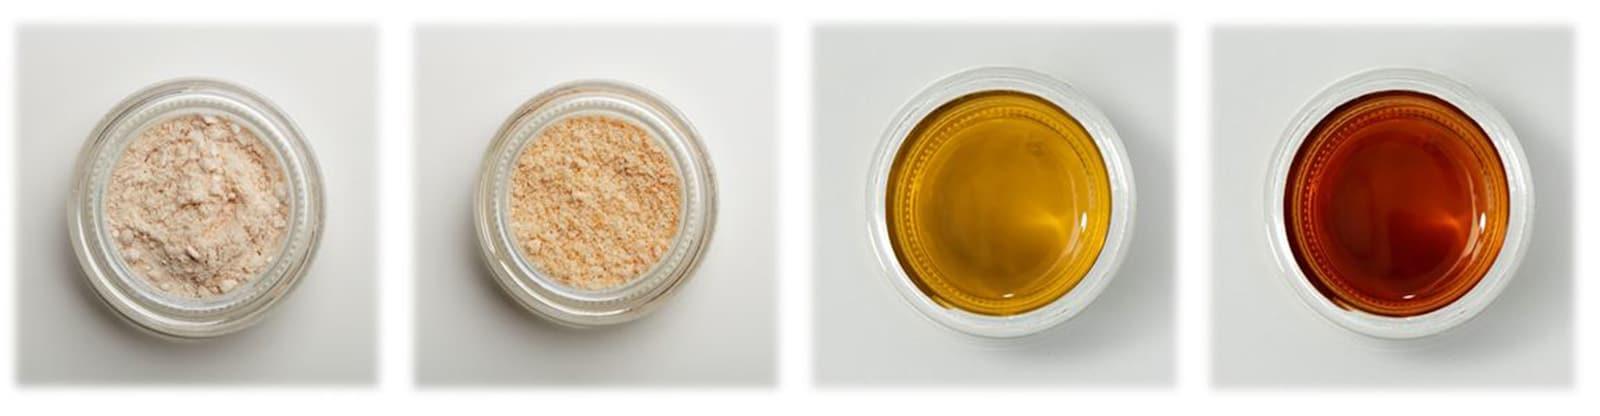 Hemp Phytocannabinoids products